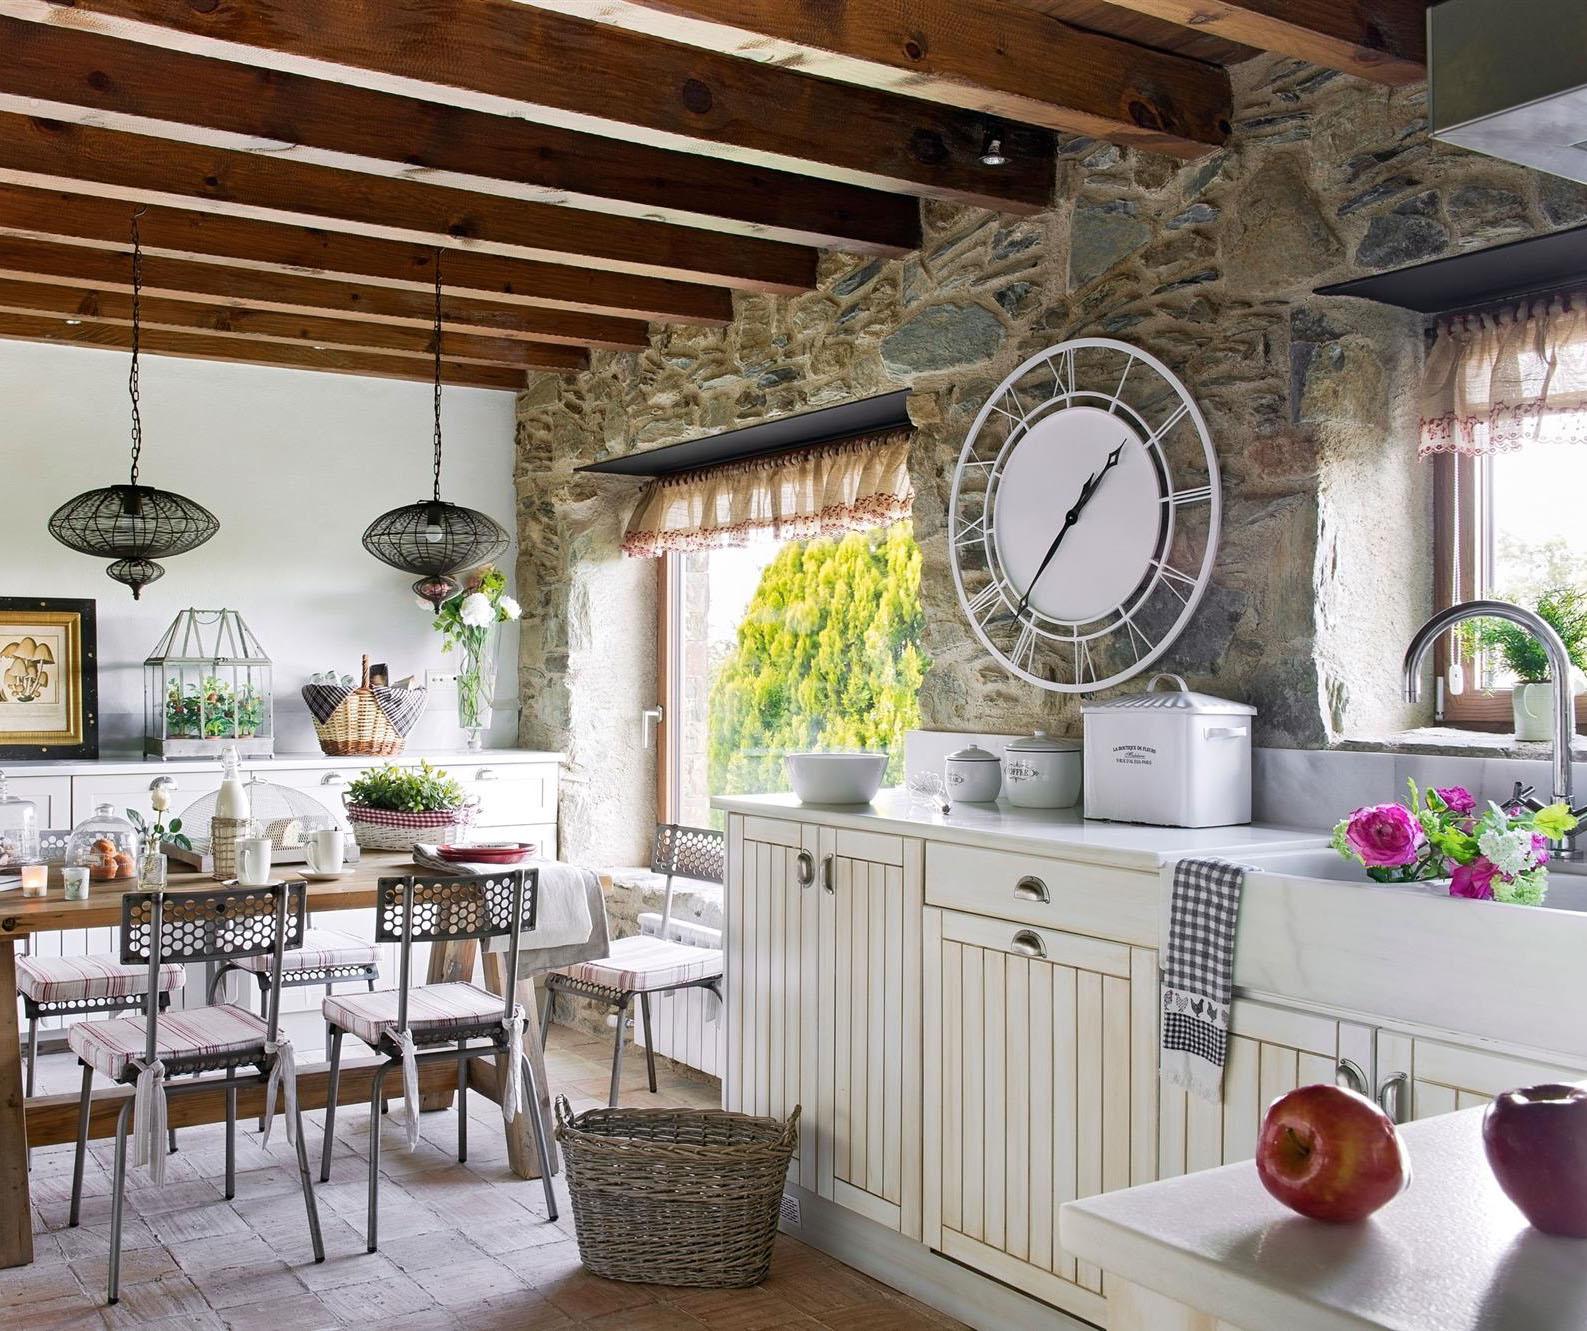 Casa tr s chic rel gios de parede for Casas modernas revestidas en piedra